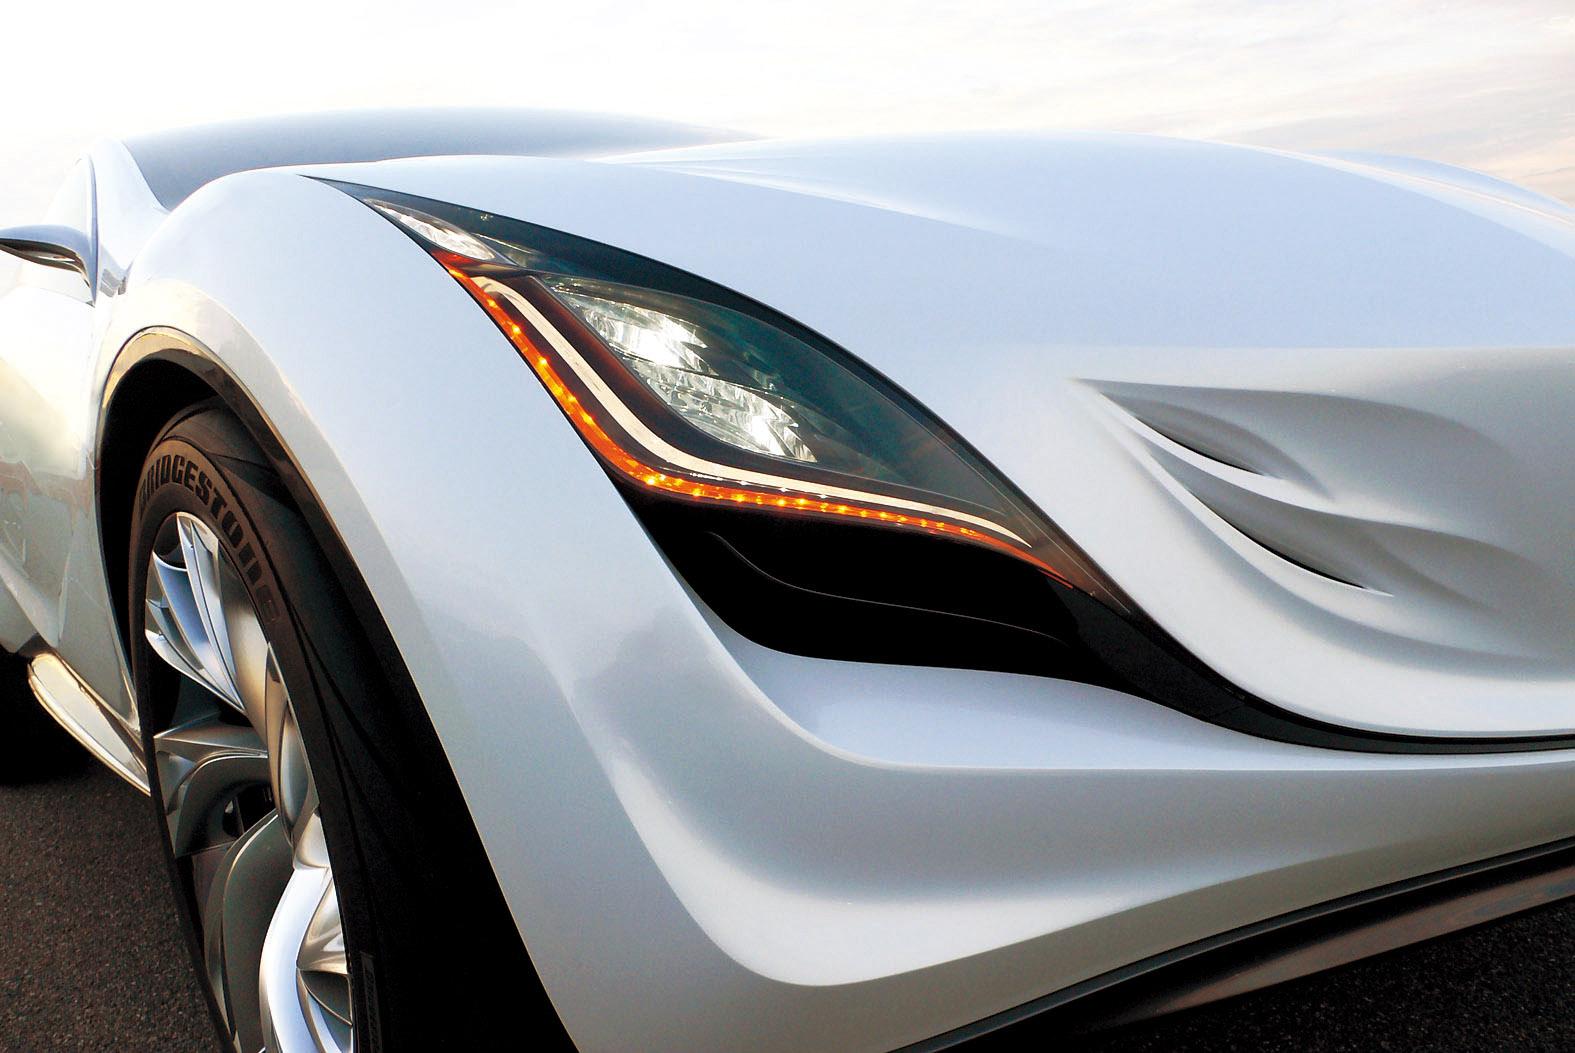 https://www.automobilesreview.com/gallery/mazda-kazamai-concept/mazda-kazamai-concept-12.jpg